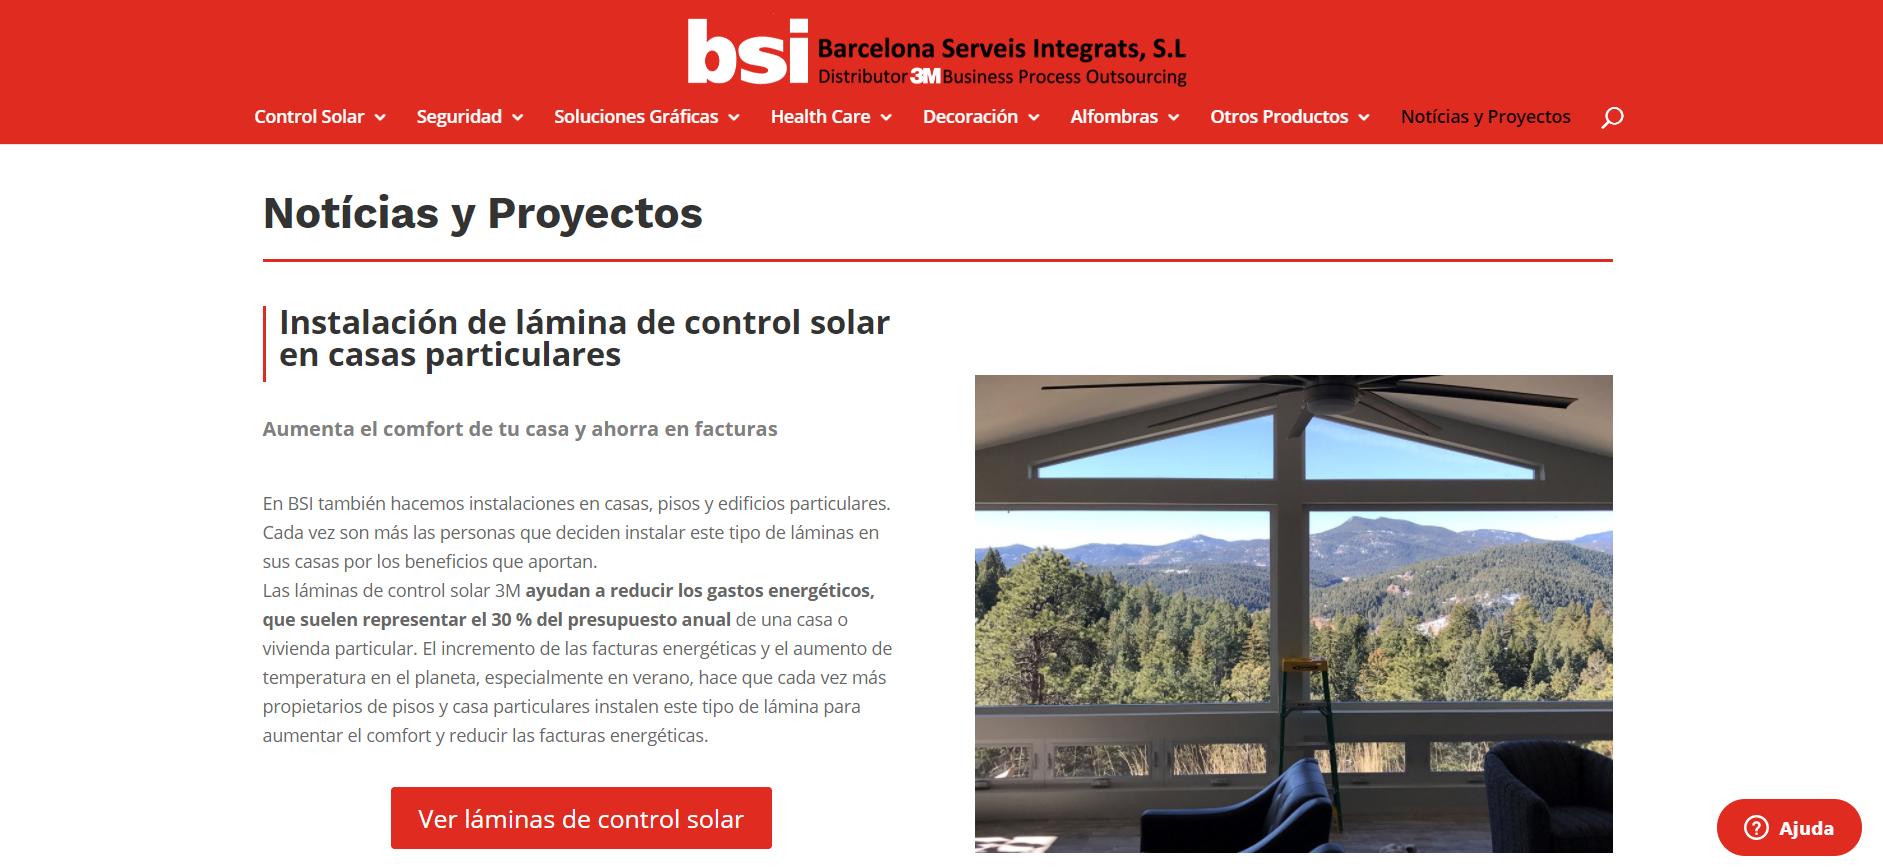 barcelona-serveis-integrats-web-disseny